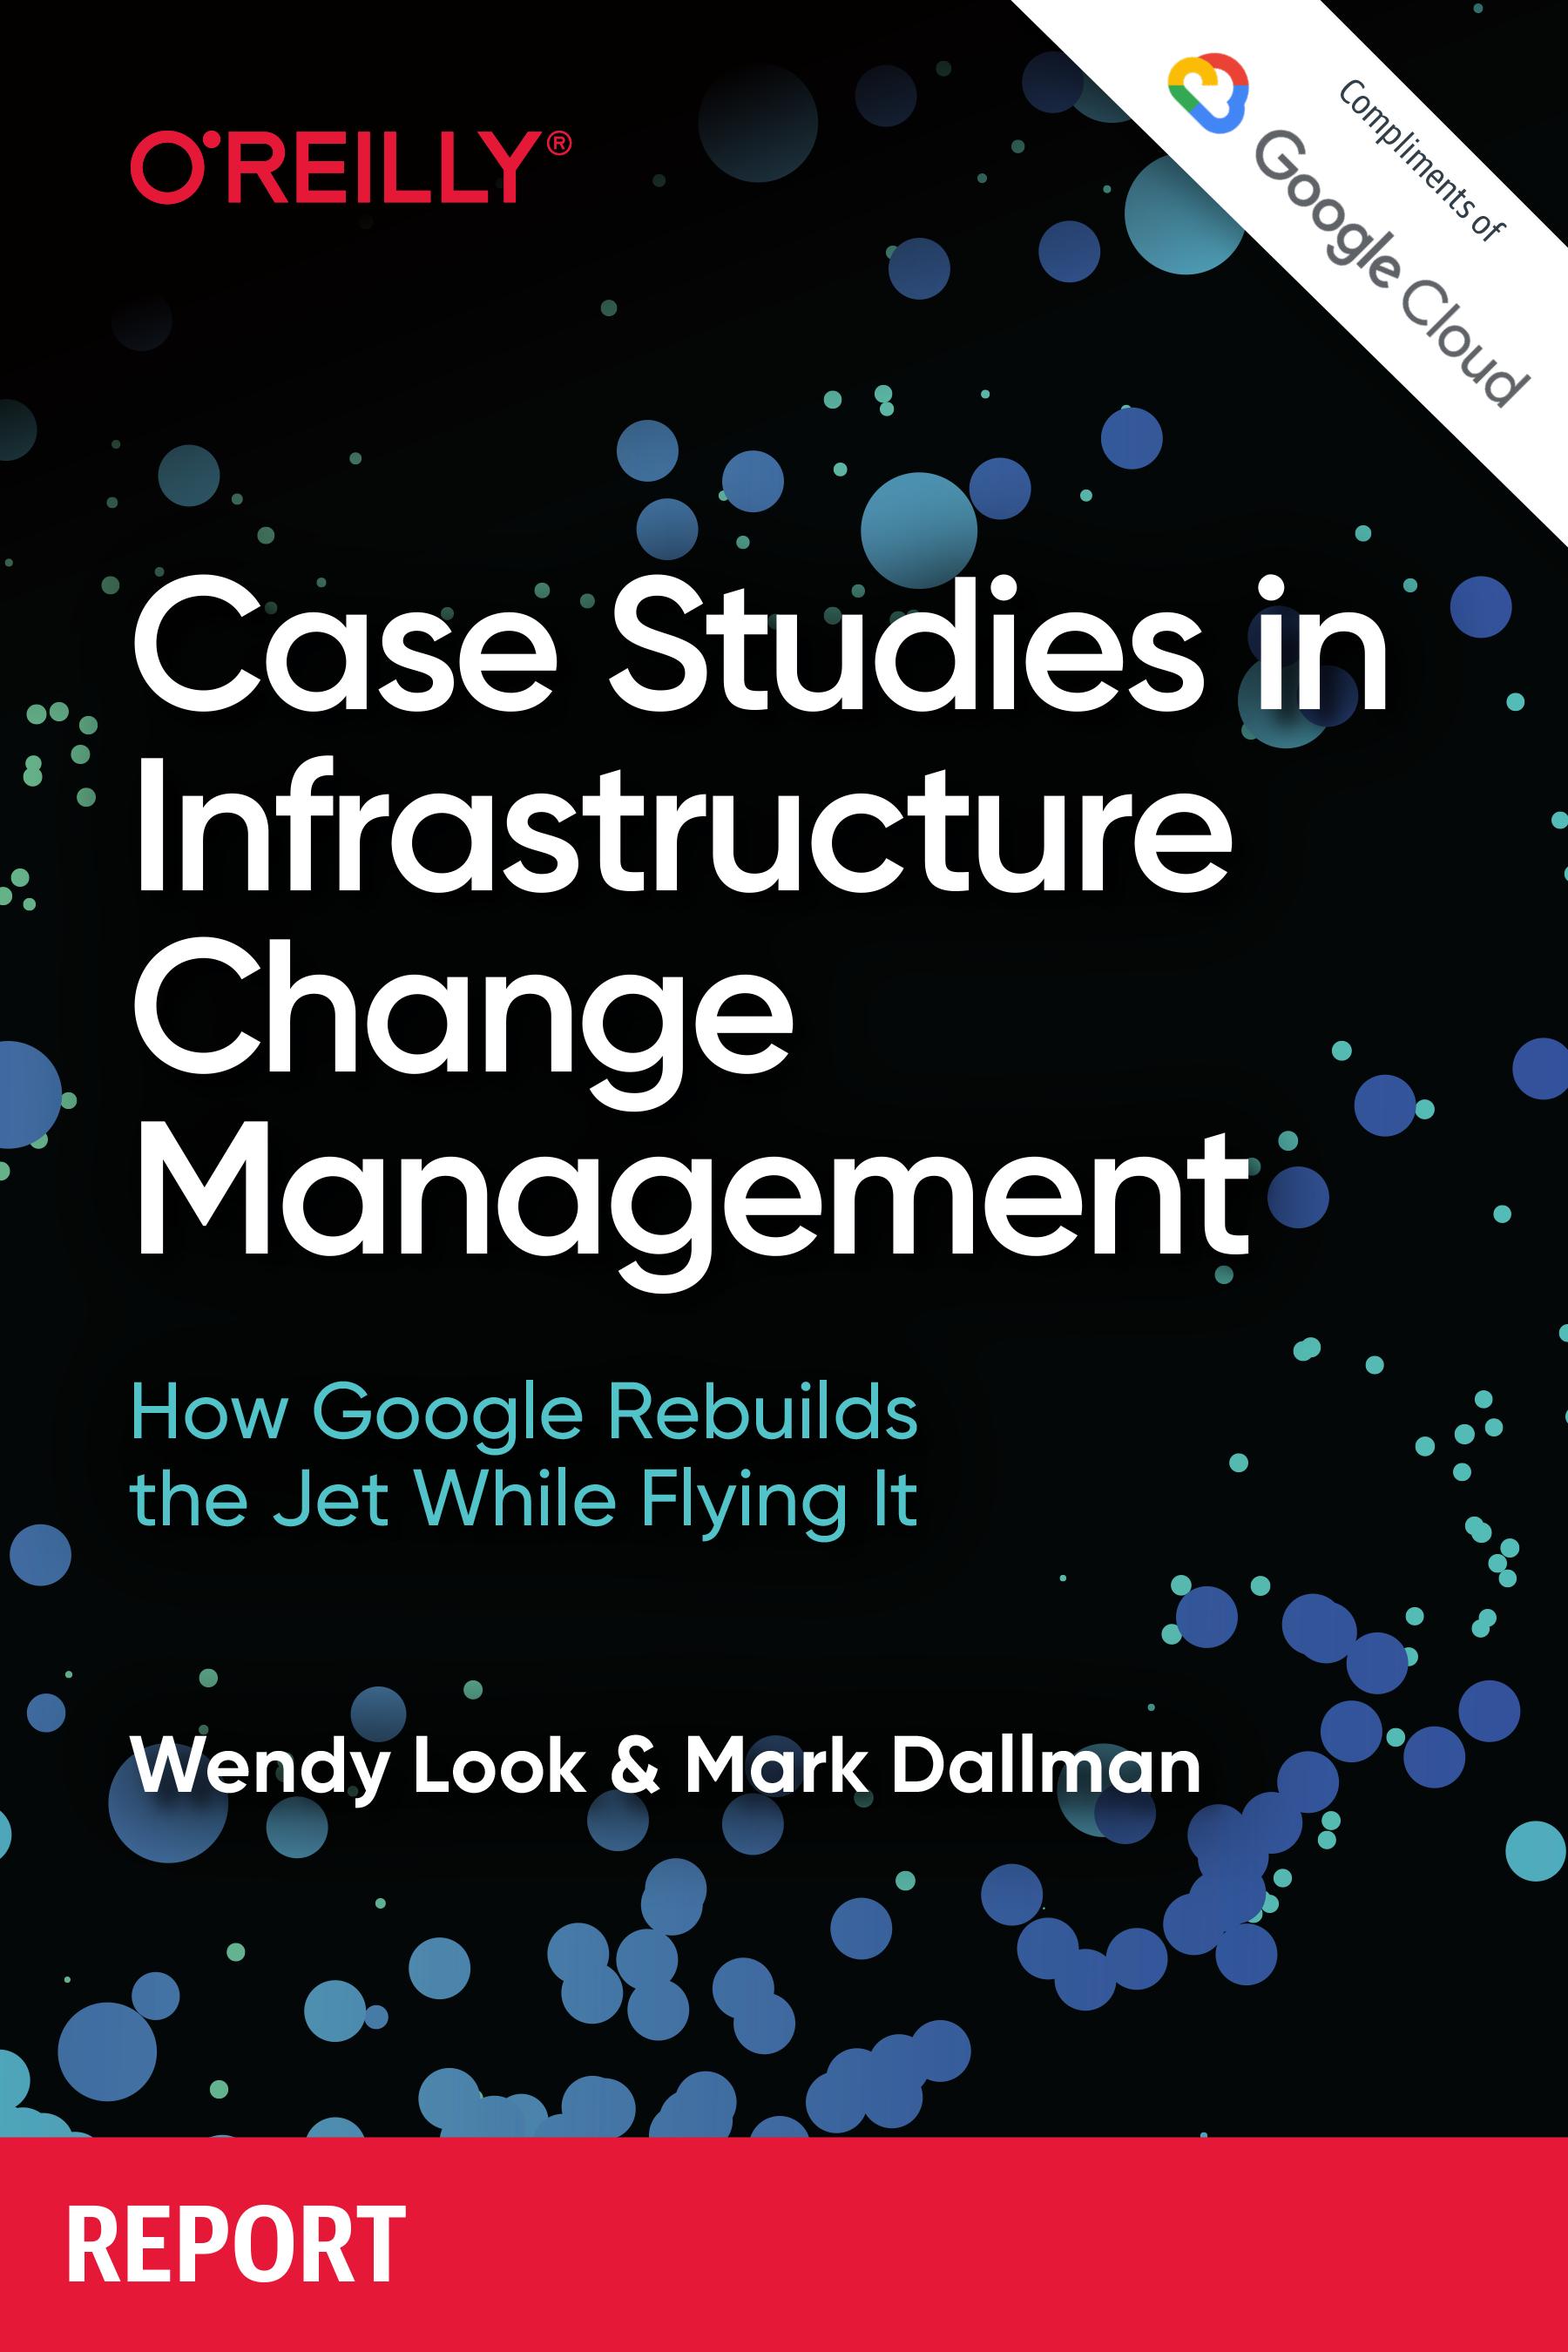 Case Studies in Infrastructure Change Management